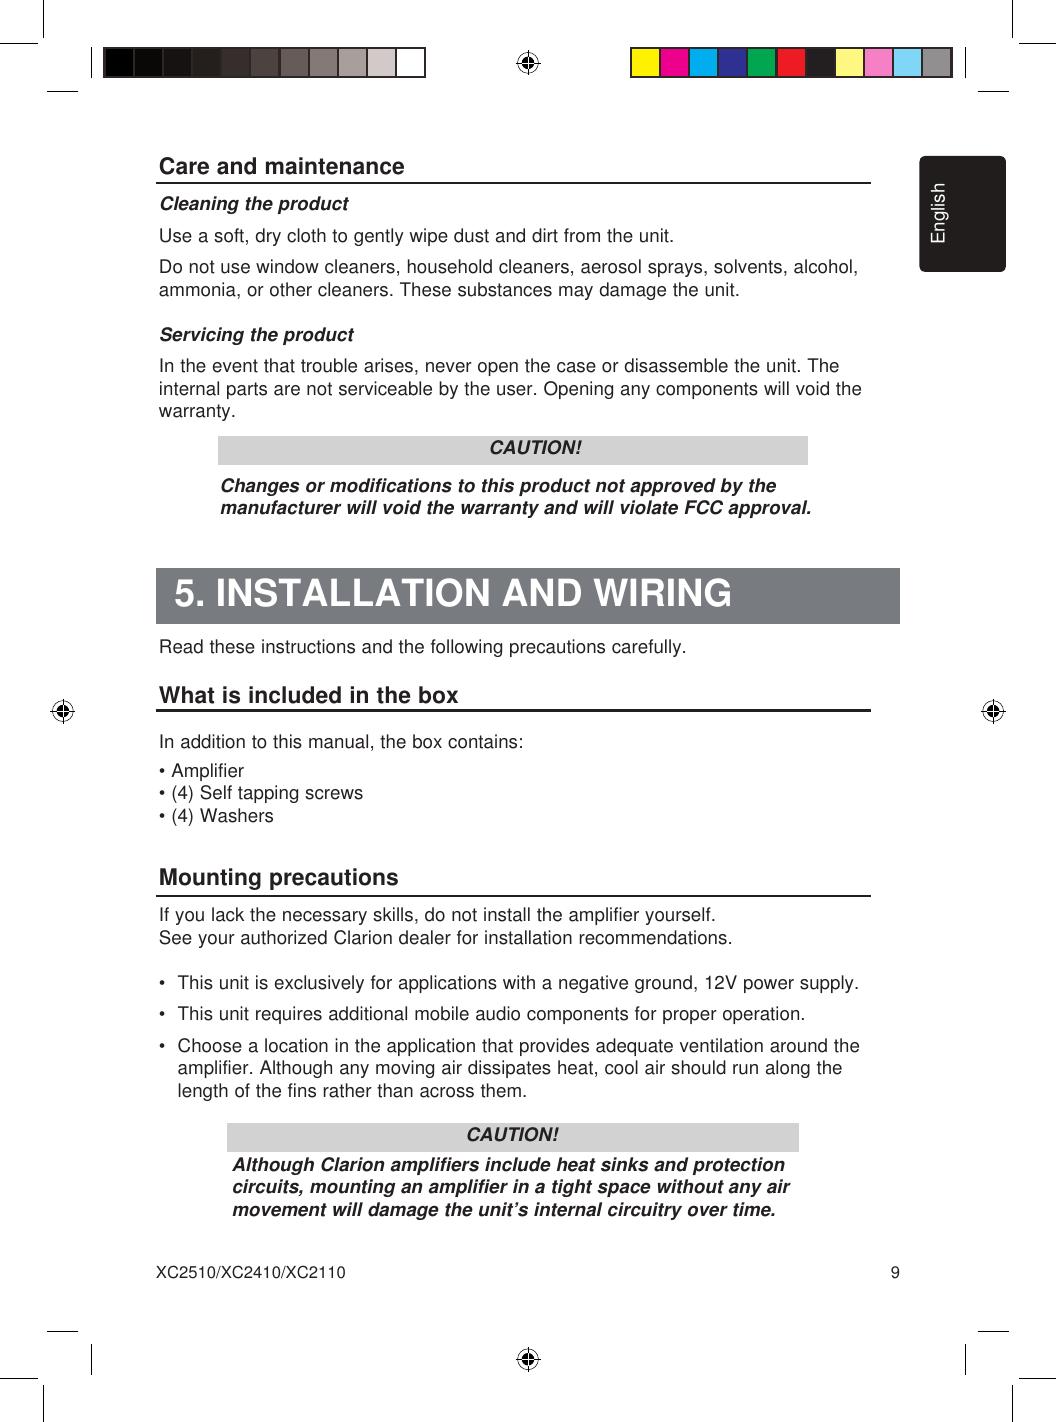 Channel Lifier Wiring Diagram On Clarion 5 Channel Speaker Wiring